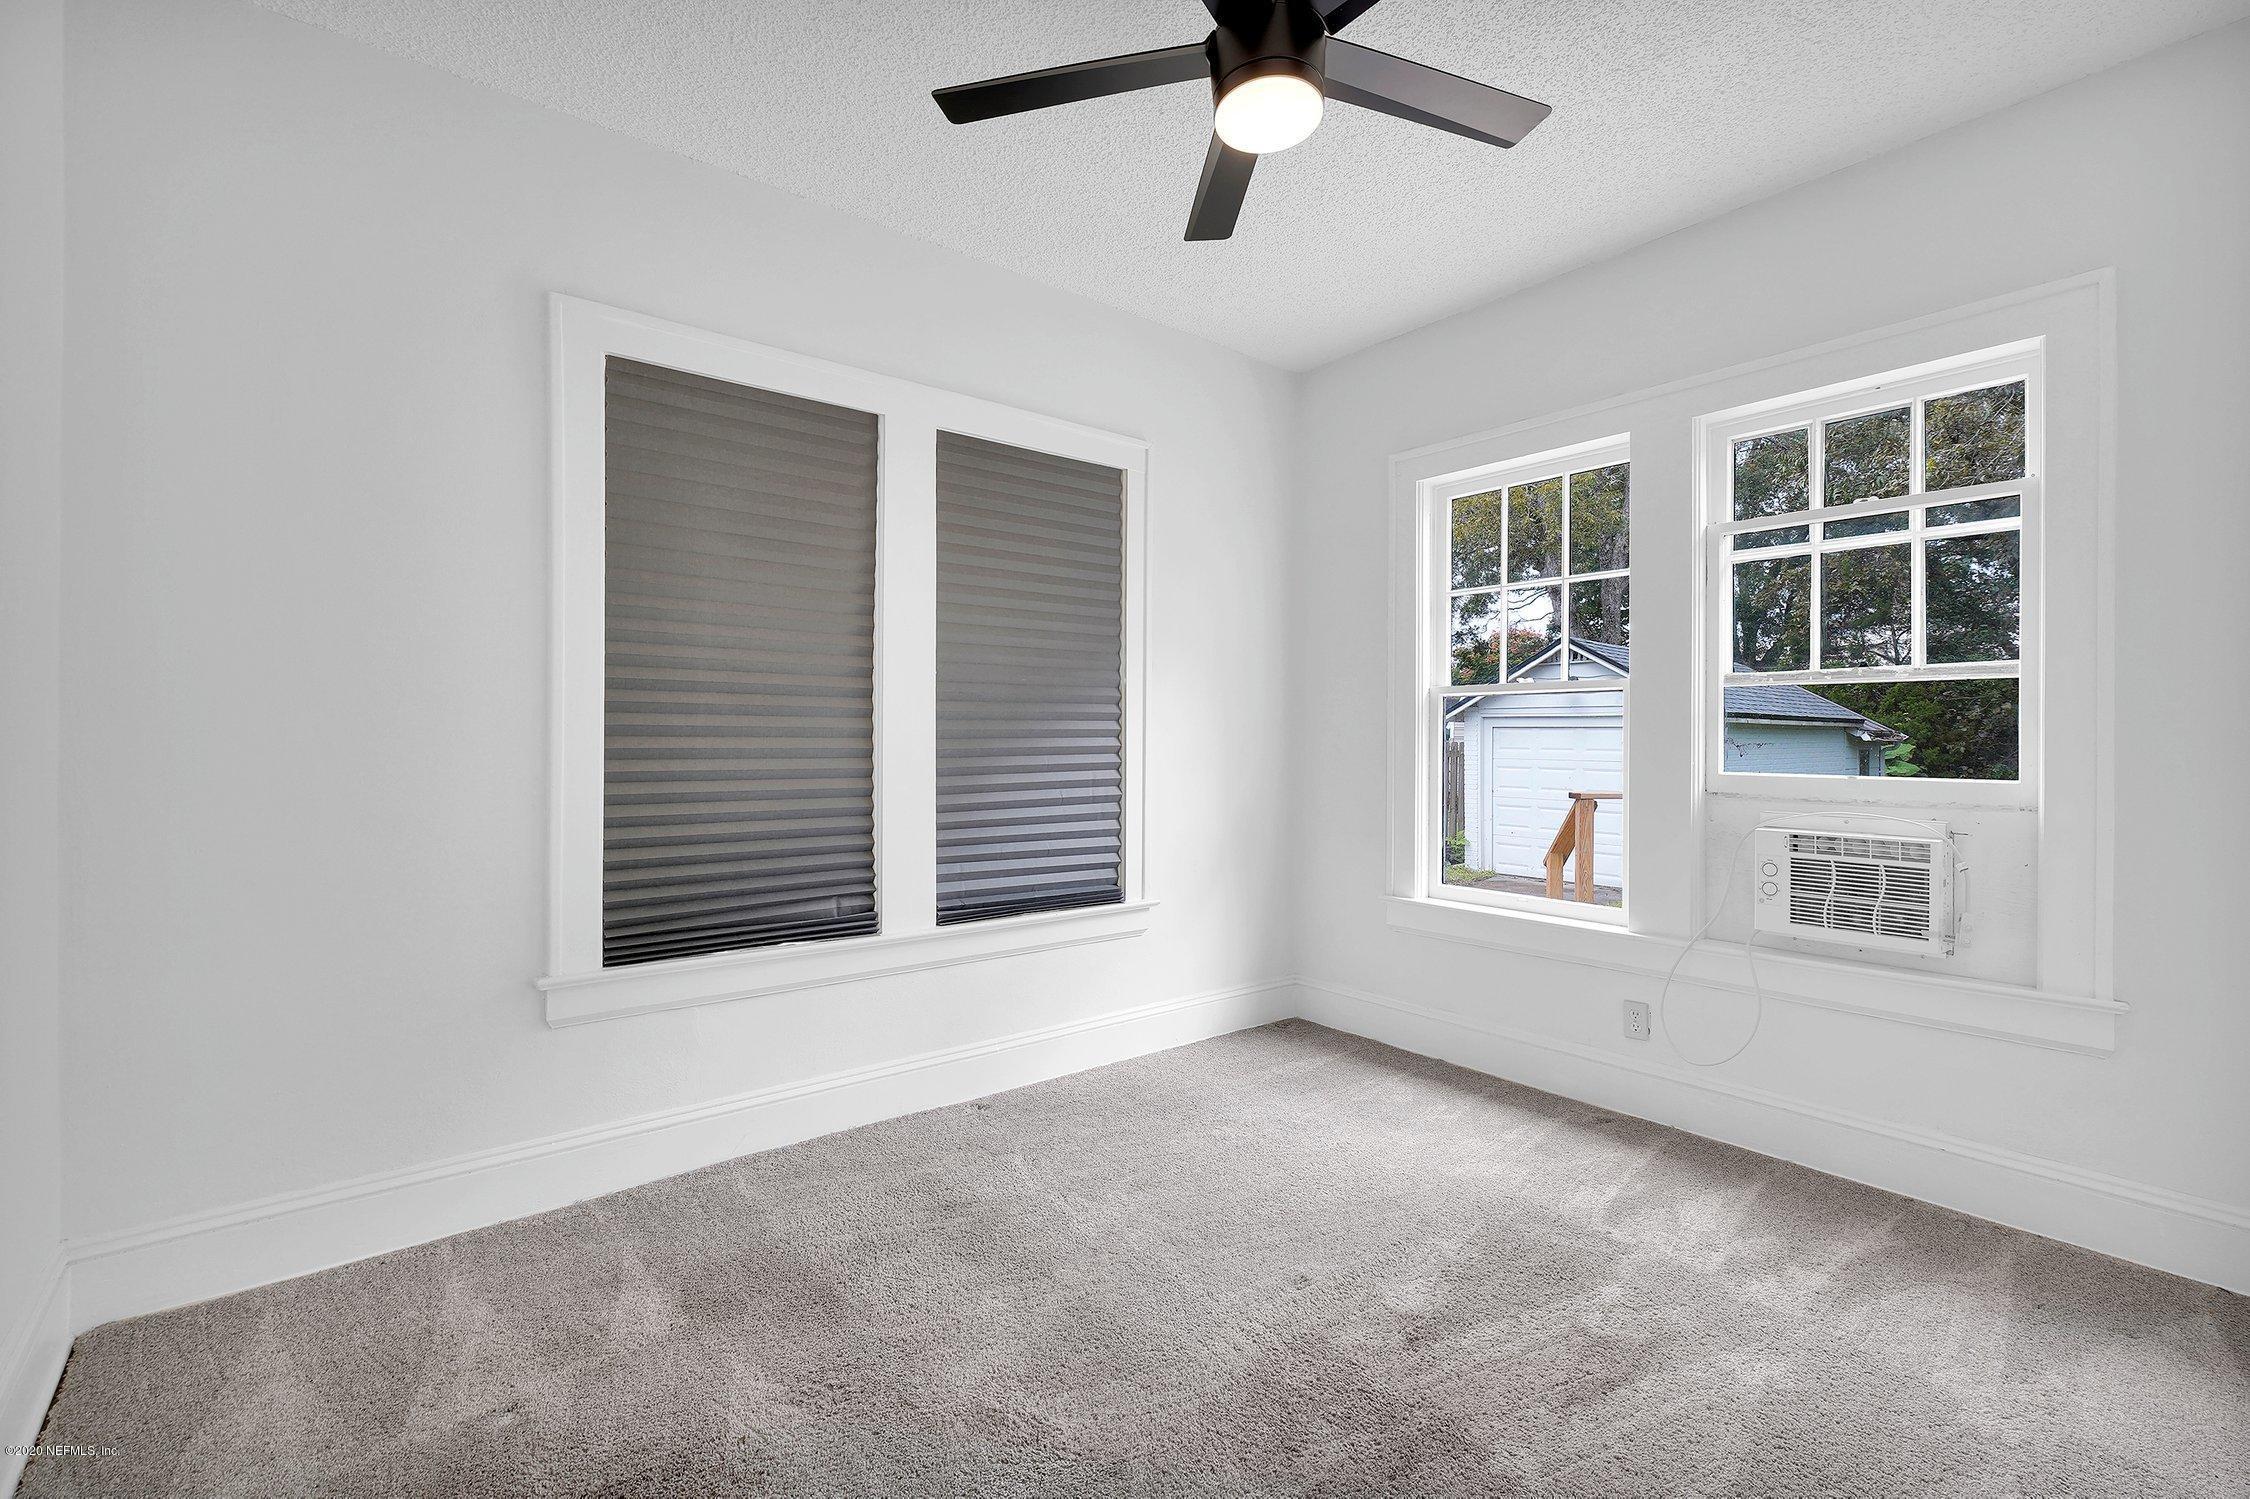 3423 MAYFLOWER, JACKSONVILLE, FLORIDA 32205, 3 Bedrooms Bedrooms, ,1 BathroomBathrooms,Residential,For sale,MAYFLOWER,1082458